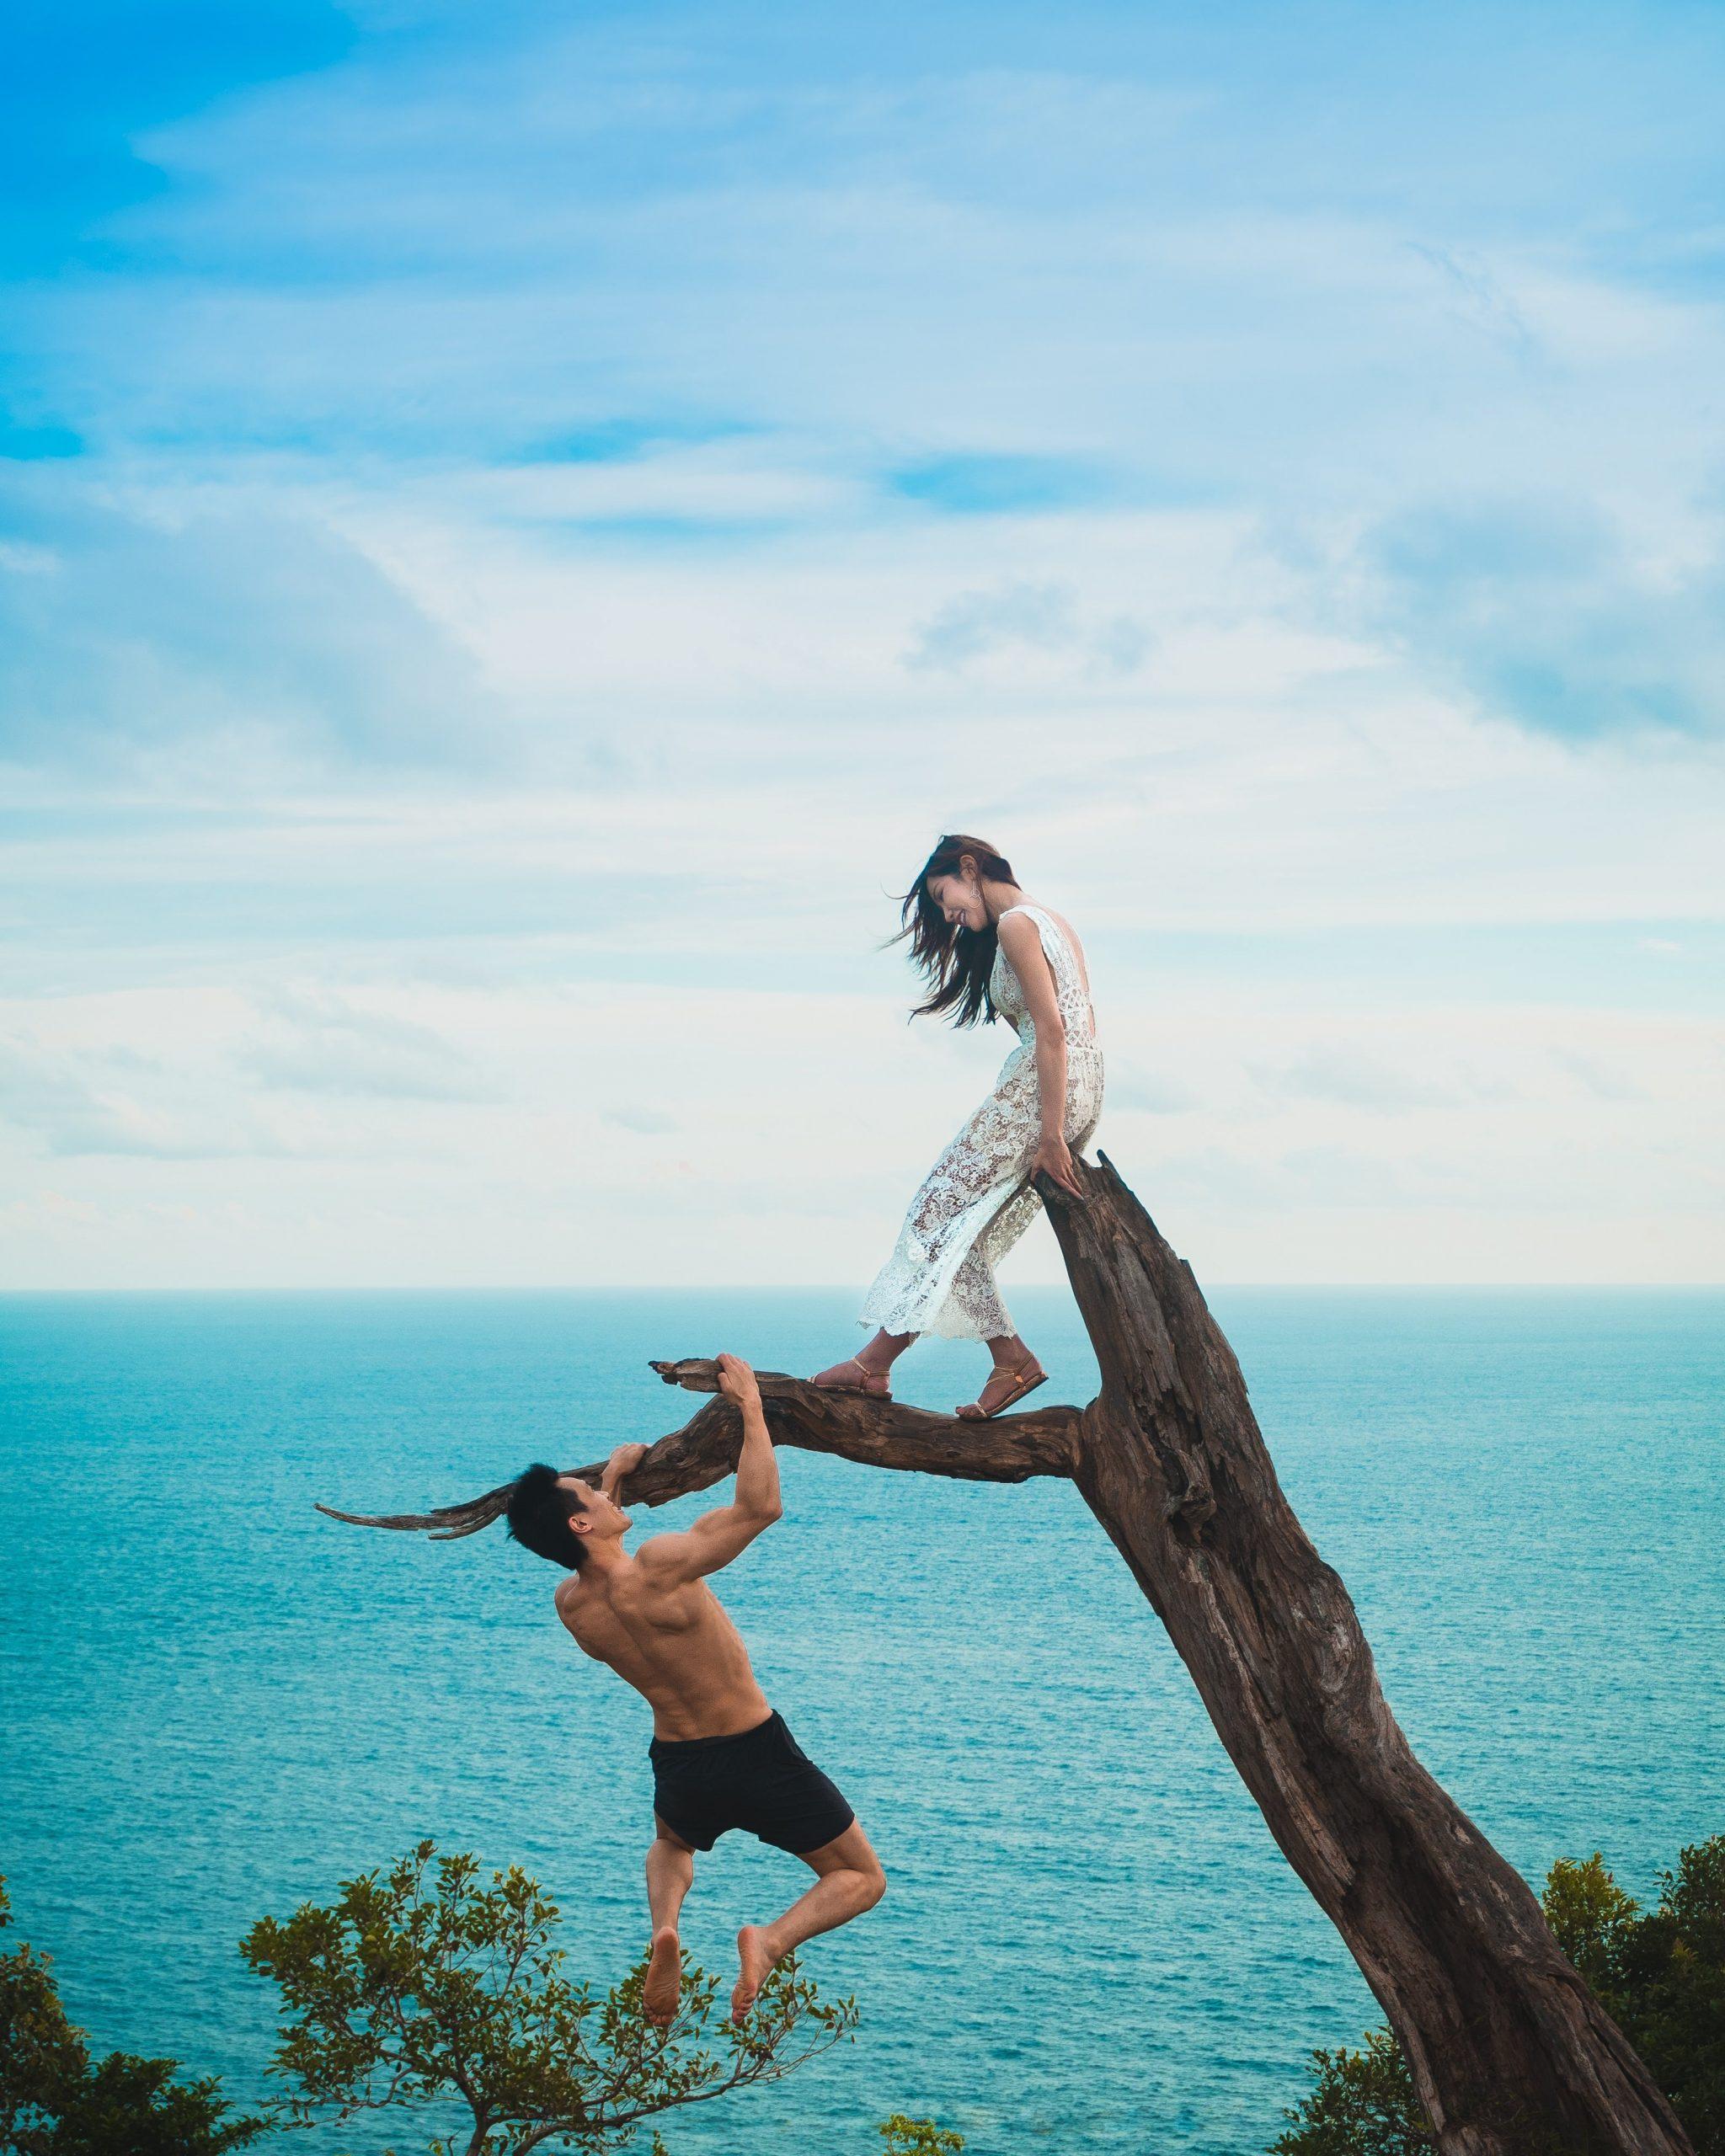 Life lessons: Πώς να διατηρήσετε τη σχέση σας ζωντανή, ακόμα κι αν είστε καιρό μαζί